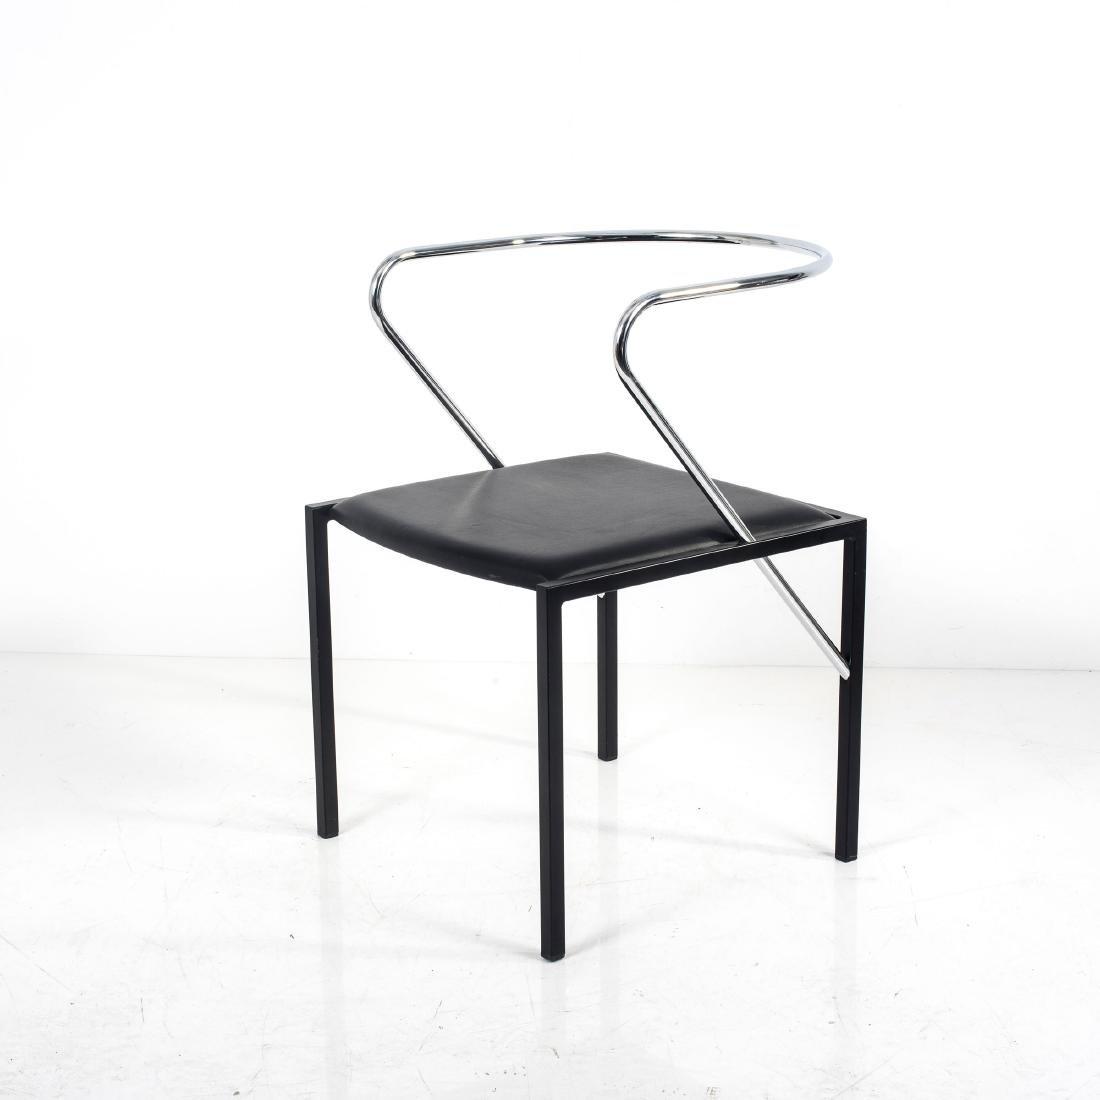 'Apple Honey chair', 1985 - 3